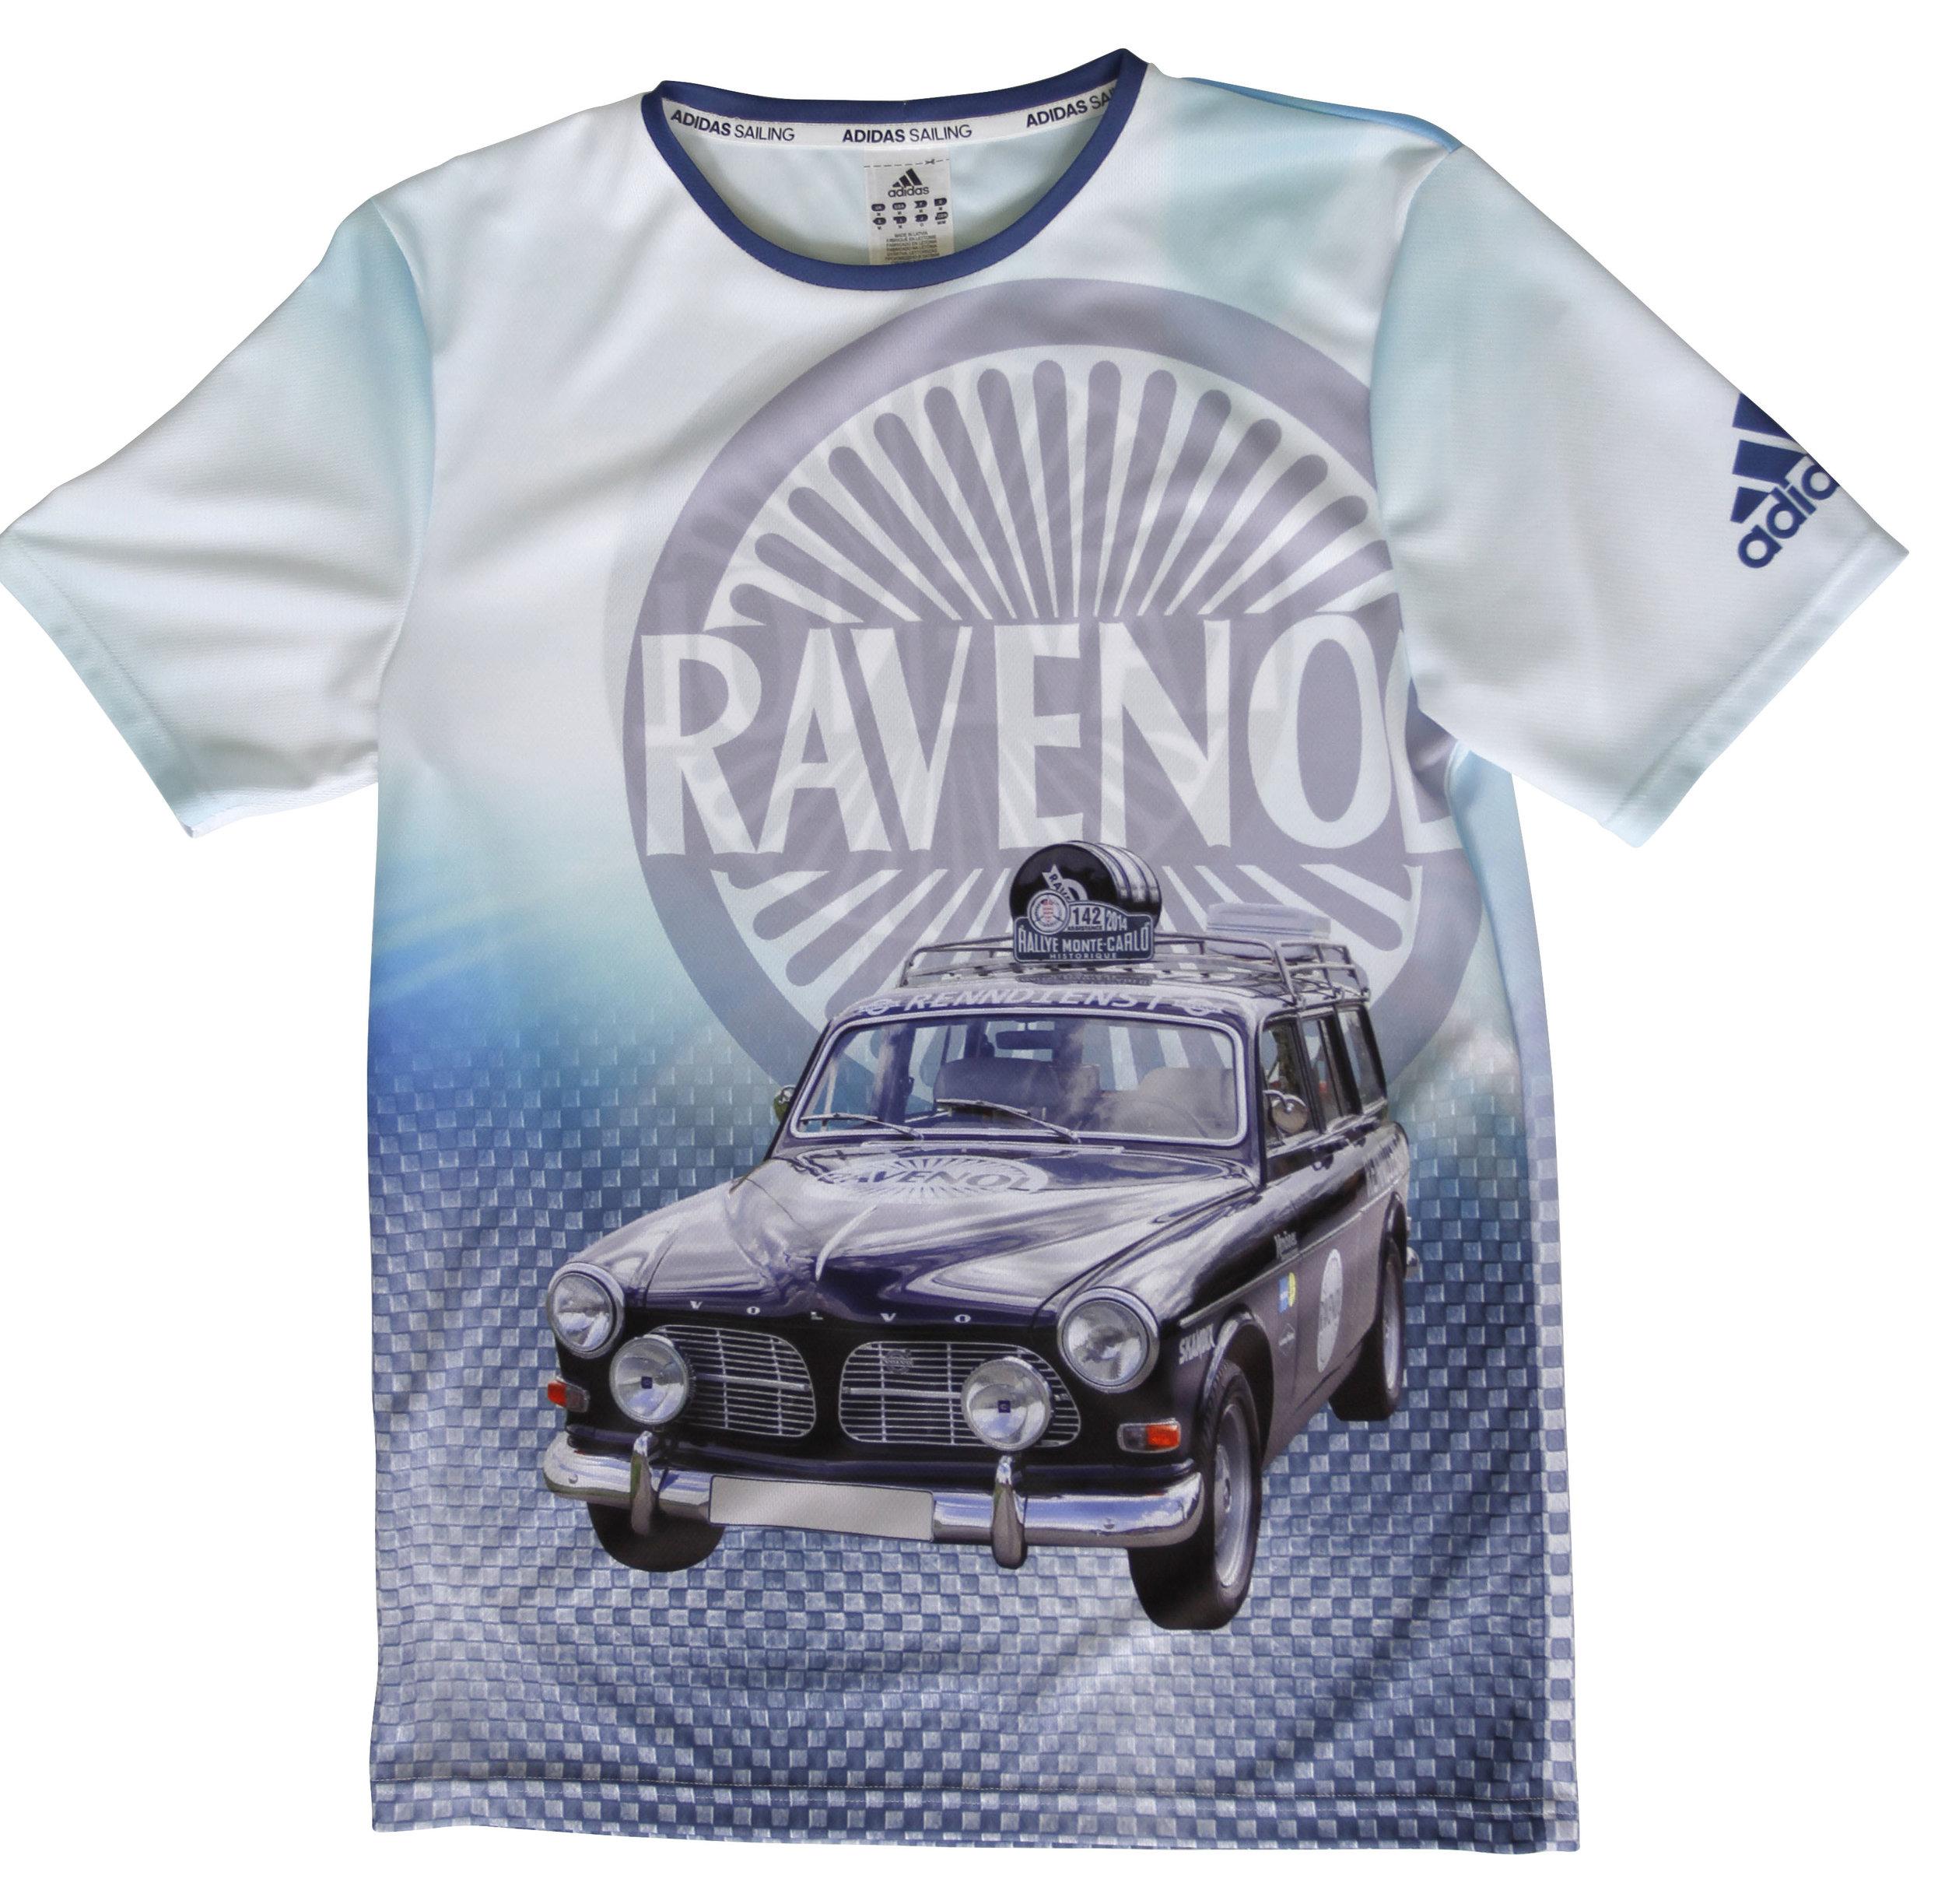 Ravenol_tee_web.jpg